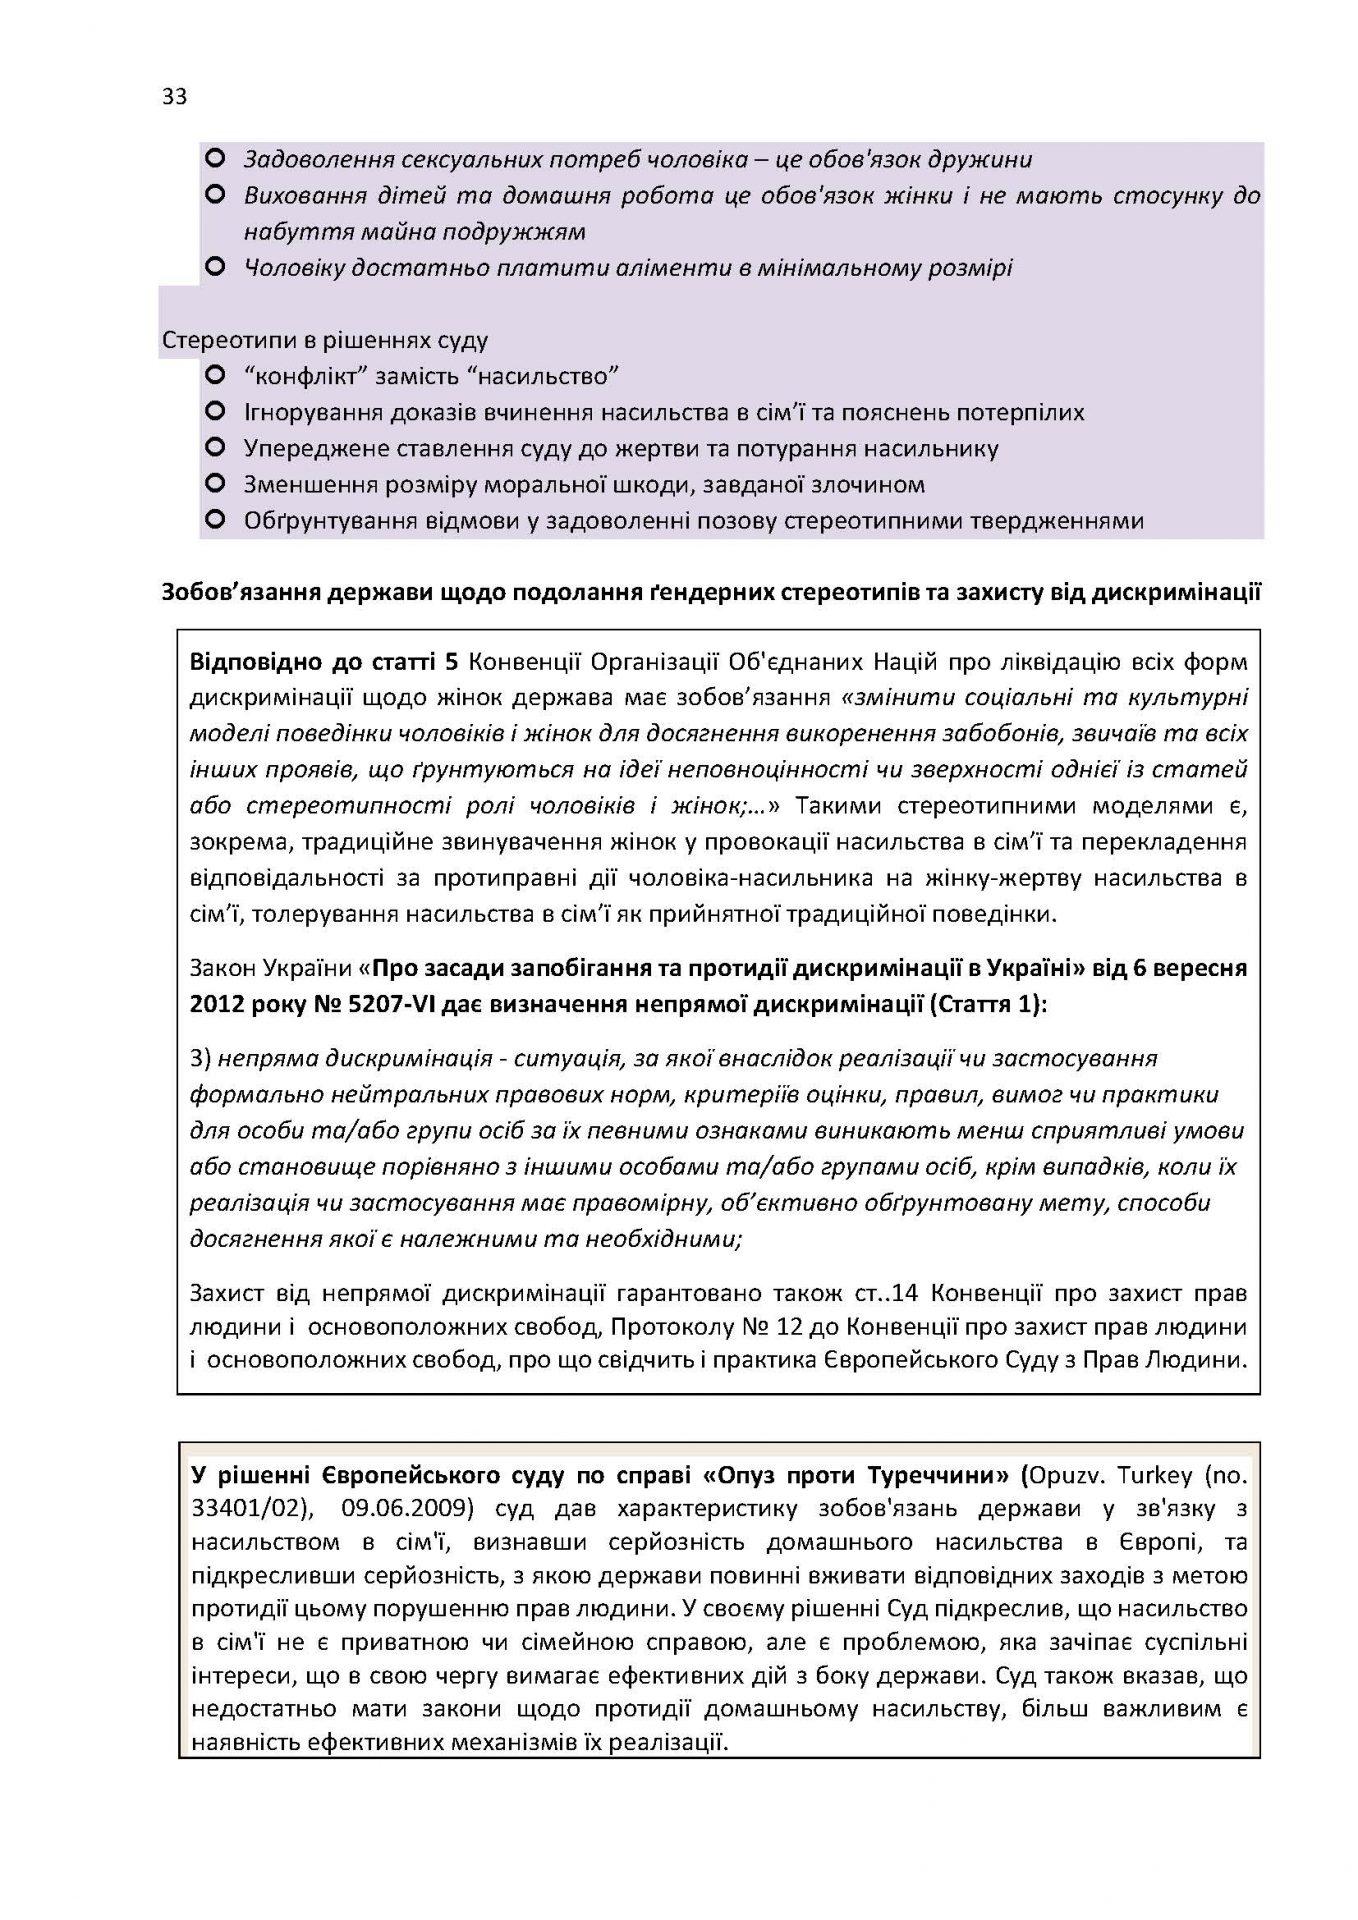 Draft Report monitoring print USAID_Страница_33